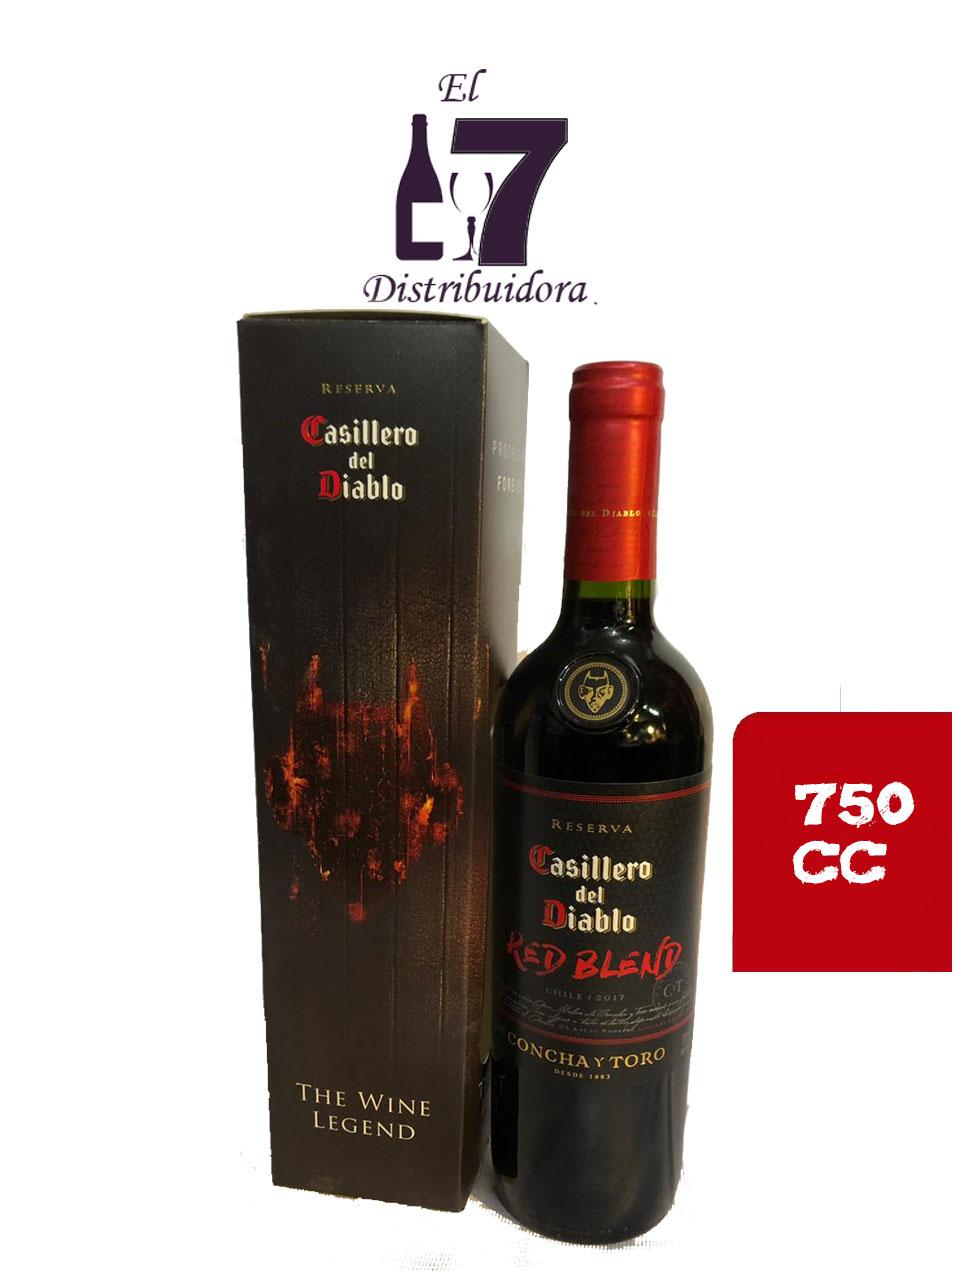 Casillero Del Diablo Red Blend 750 cc